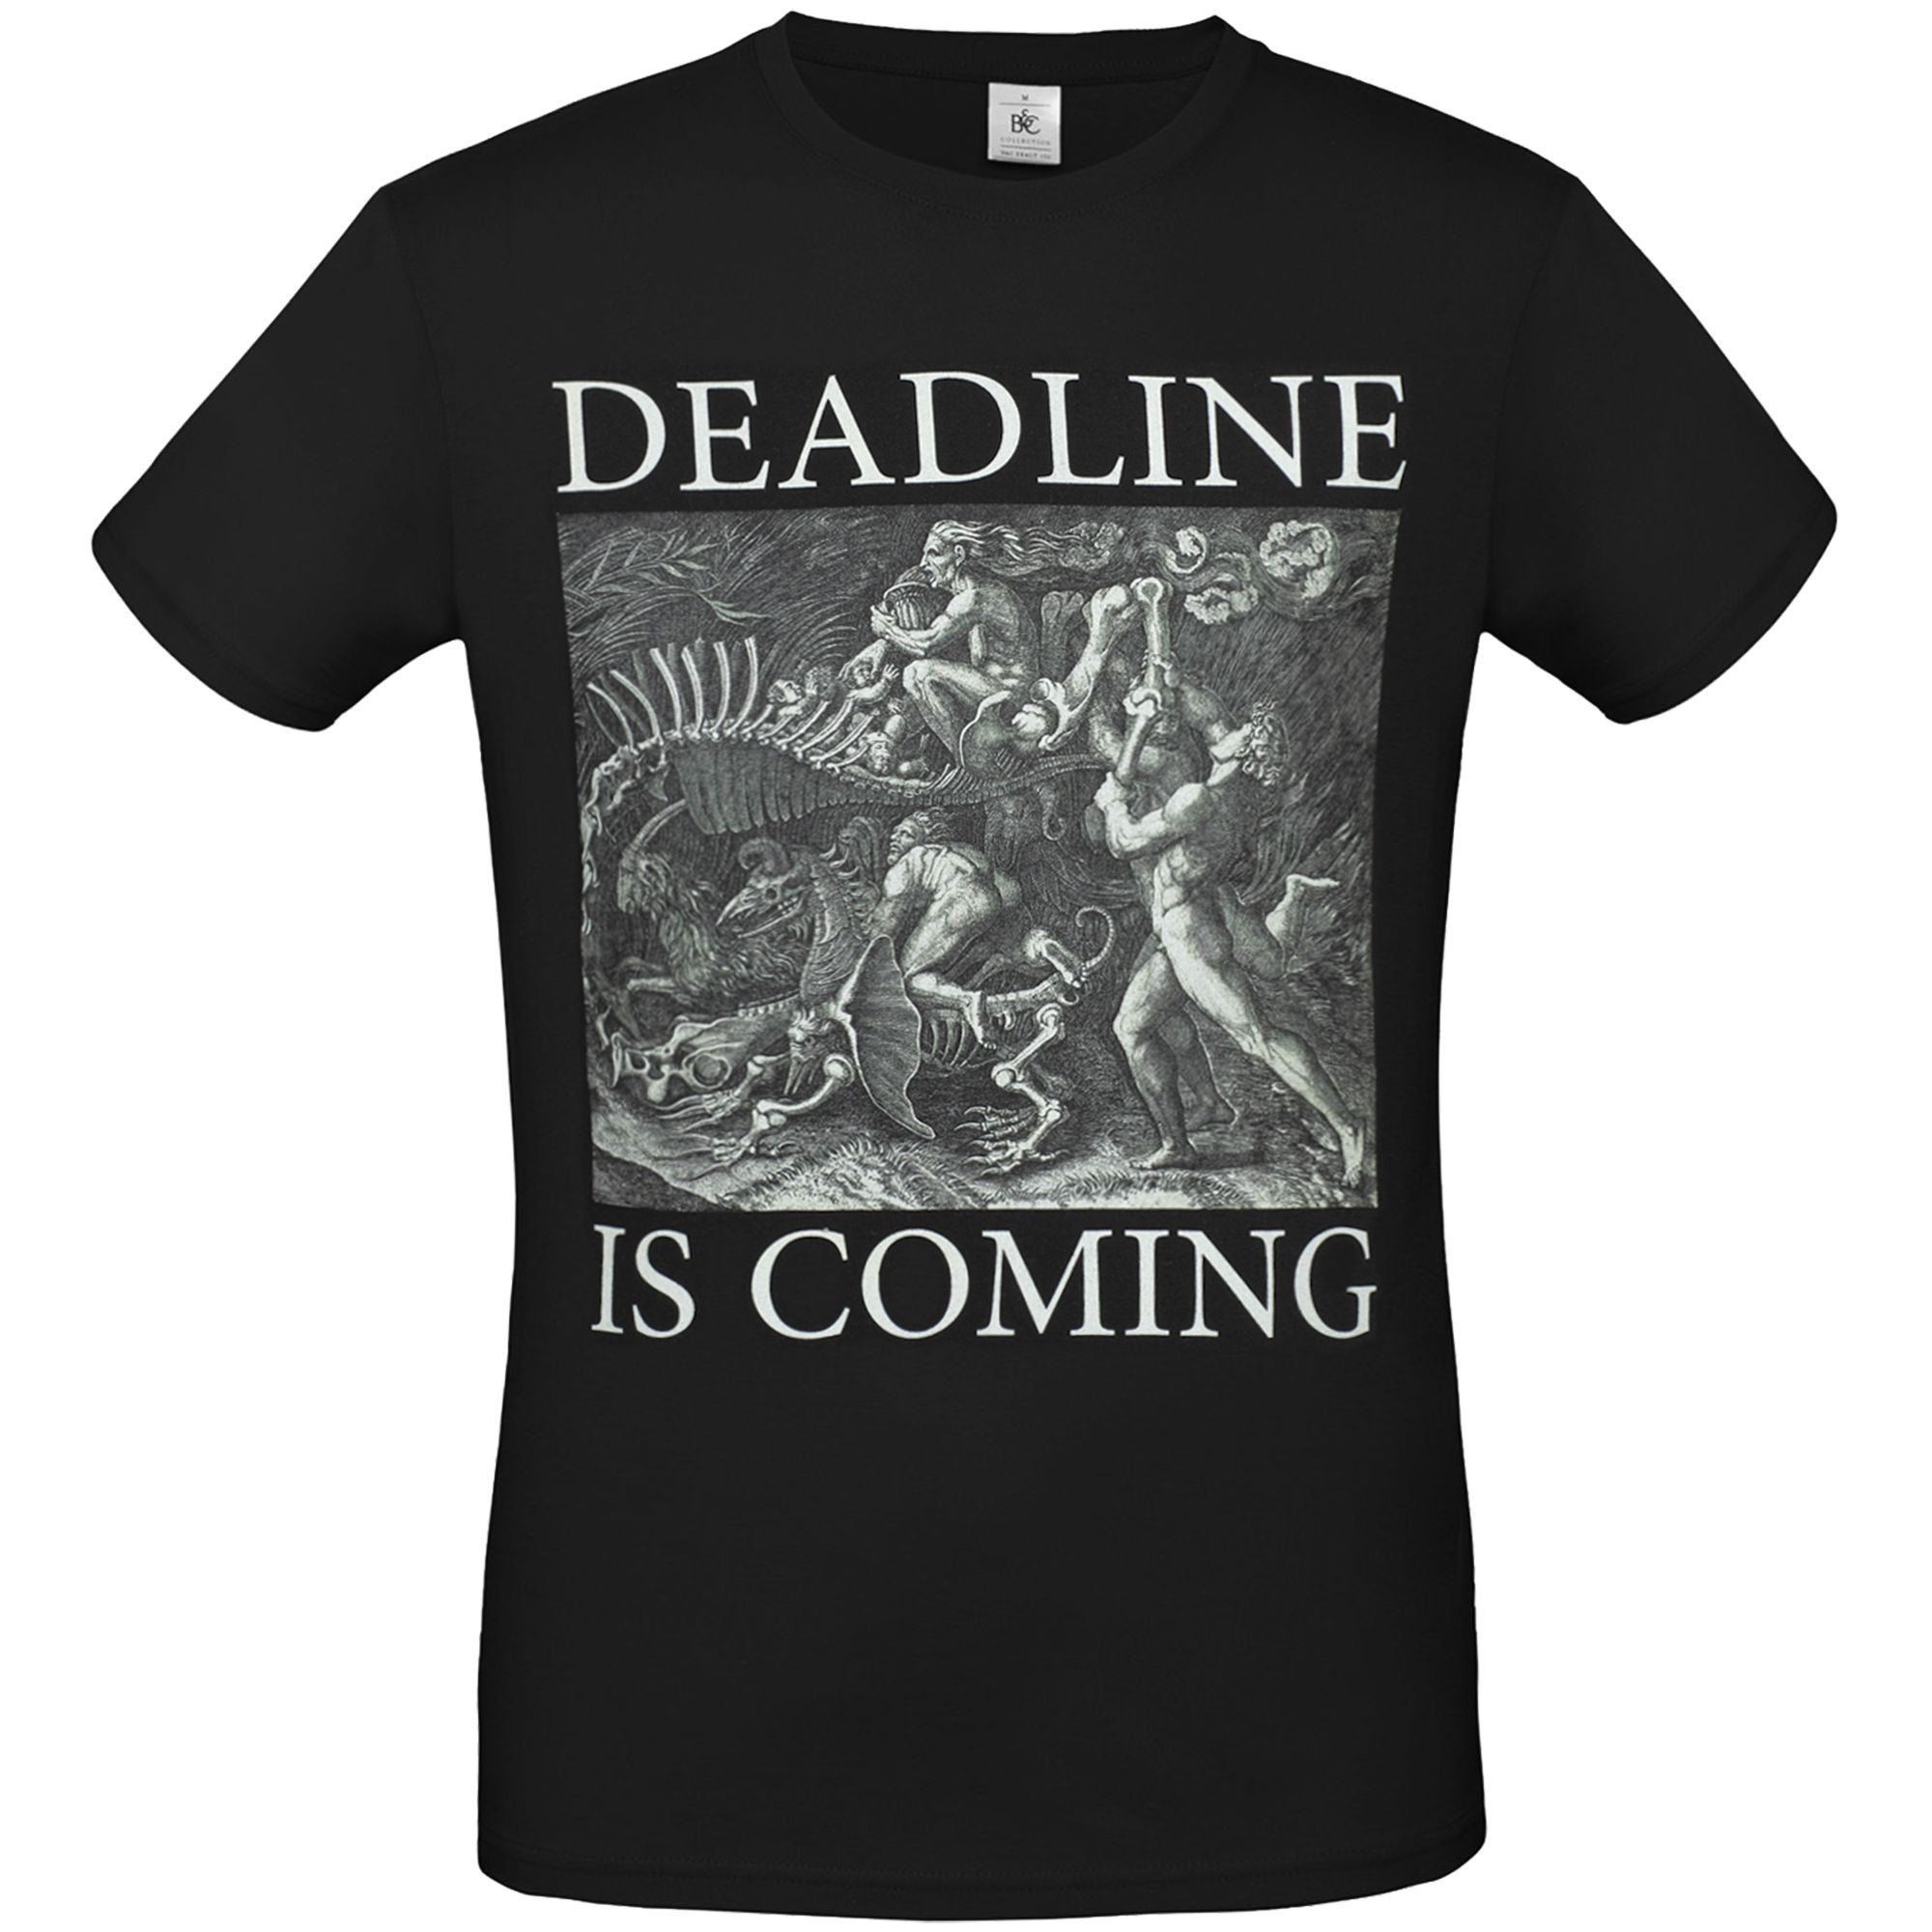 Футболка унисекс Deadline, черная